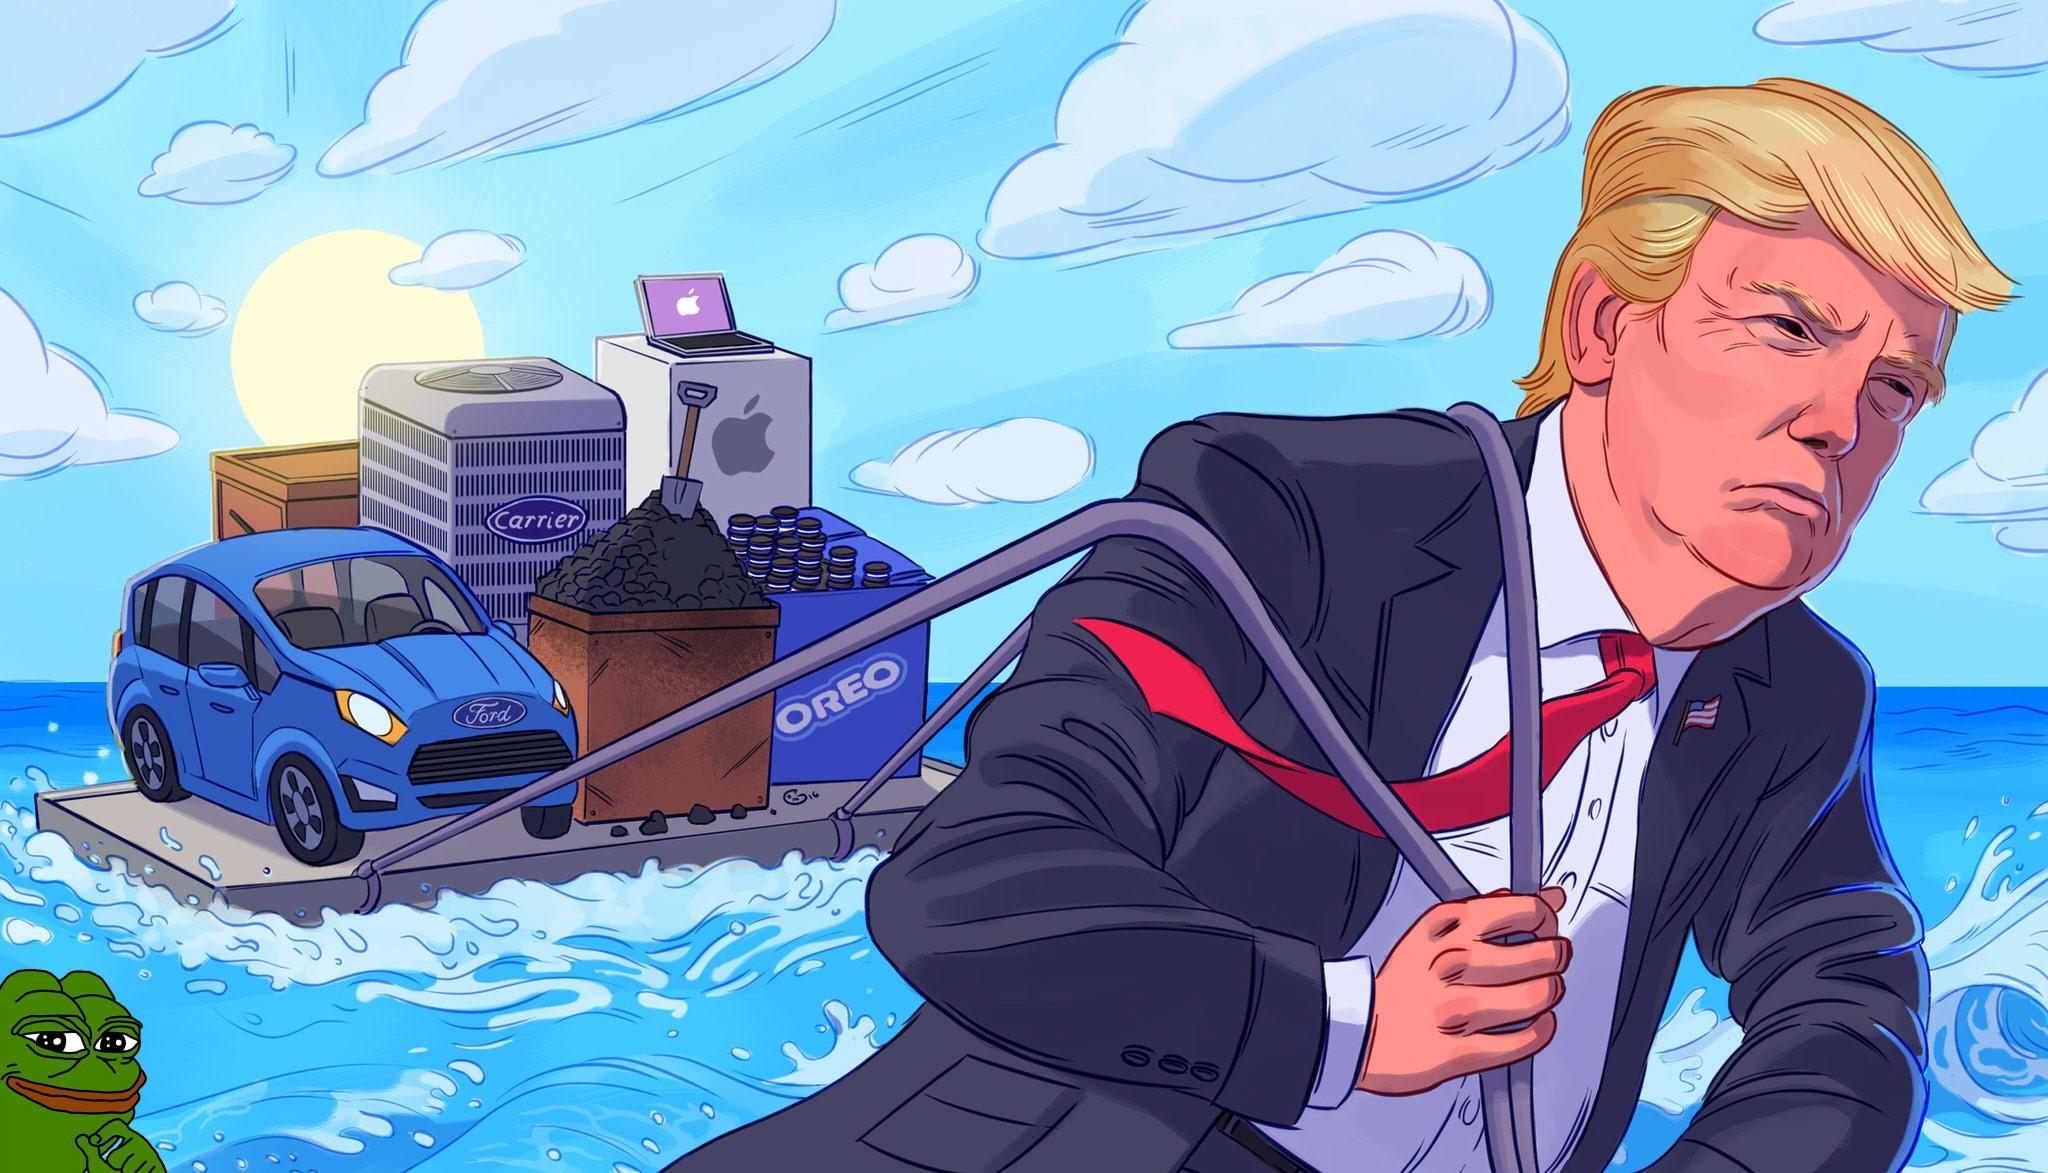 Donald Trump HD Wallpaper   Background Image   2048x1173 ...